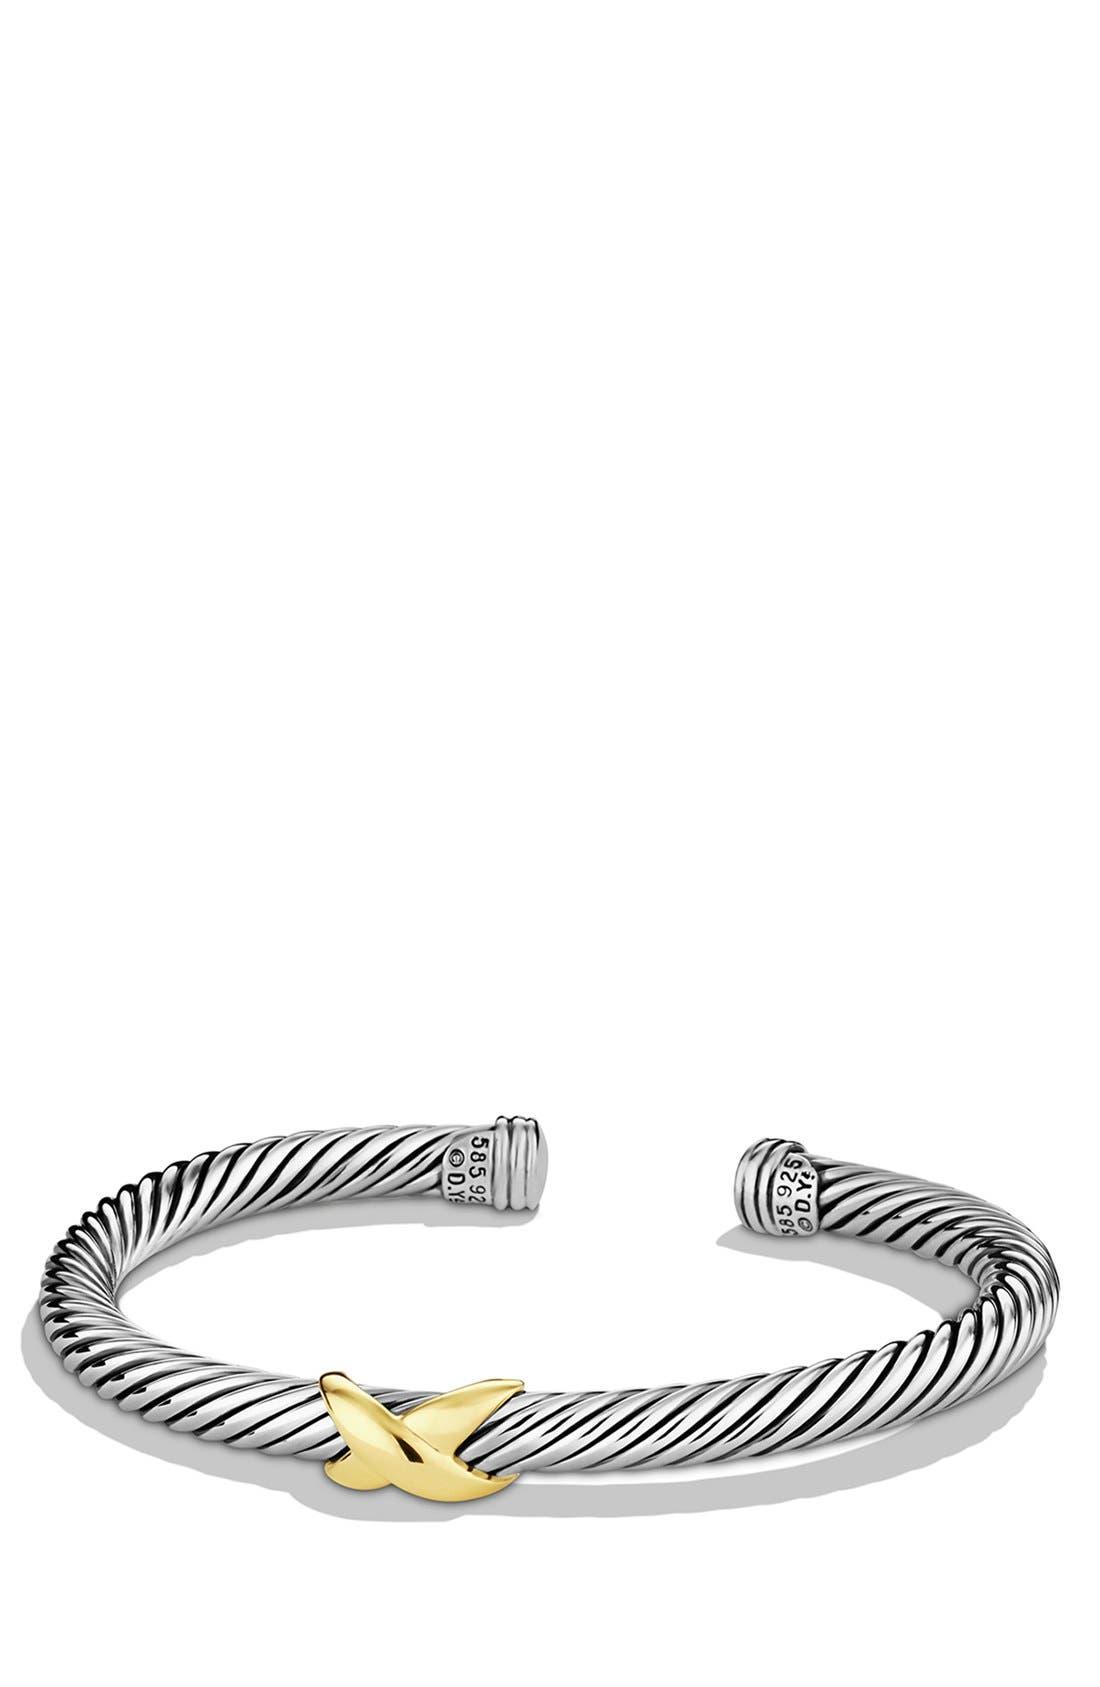 Main Image - David Yurman 'X' Bracelet with Gold